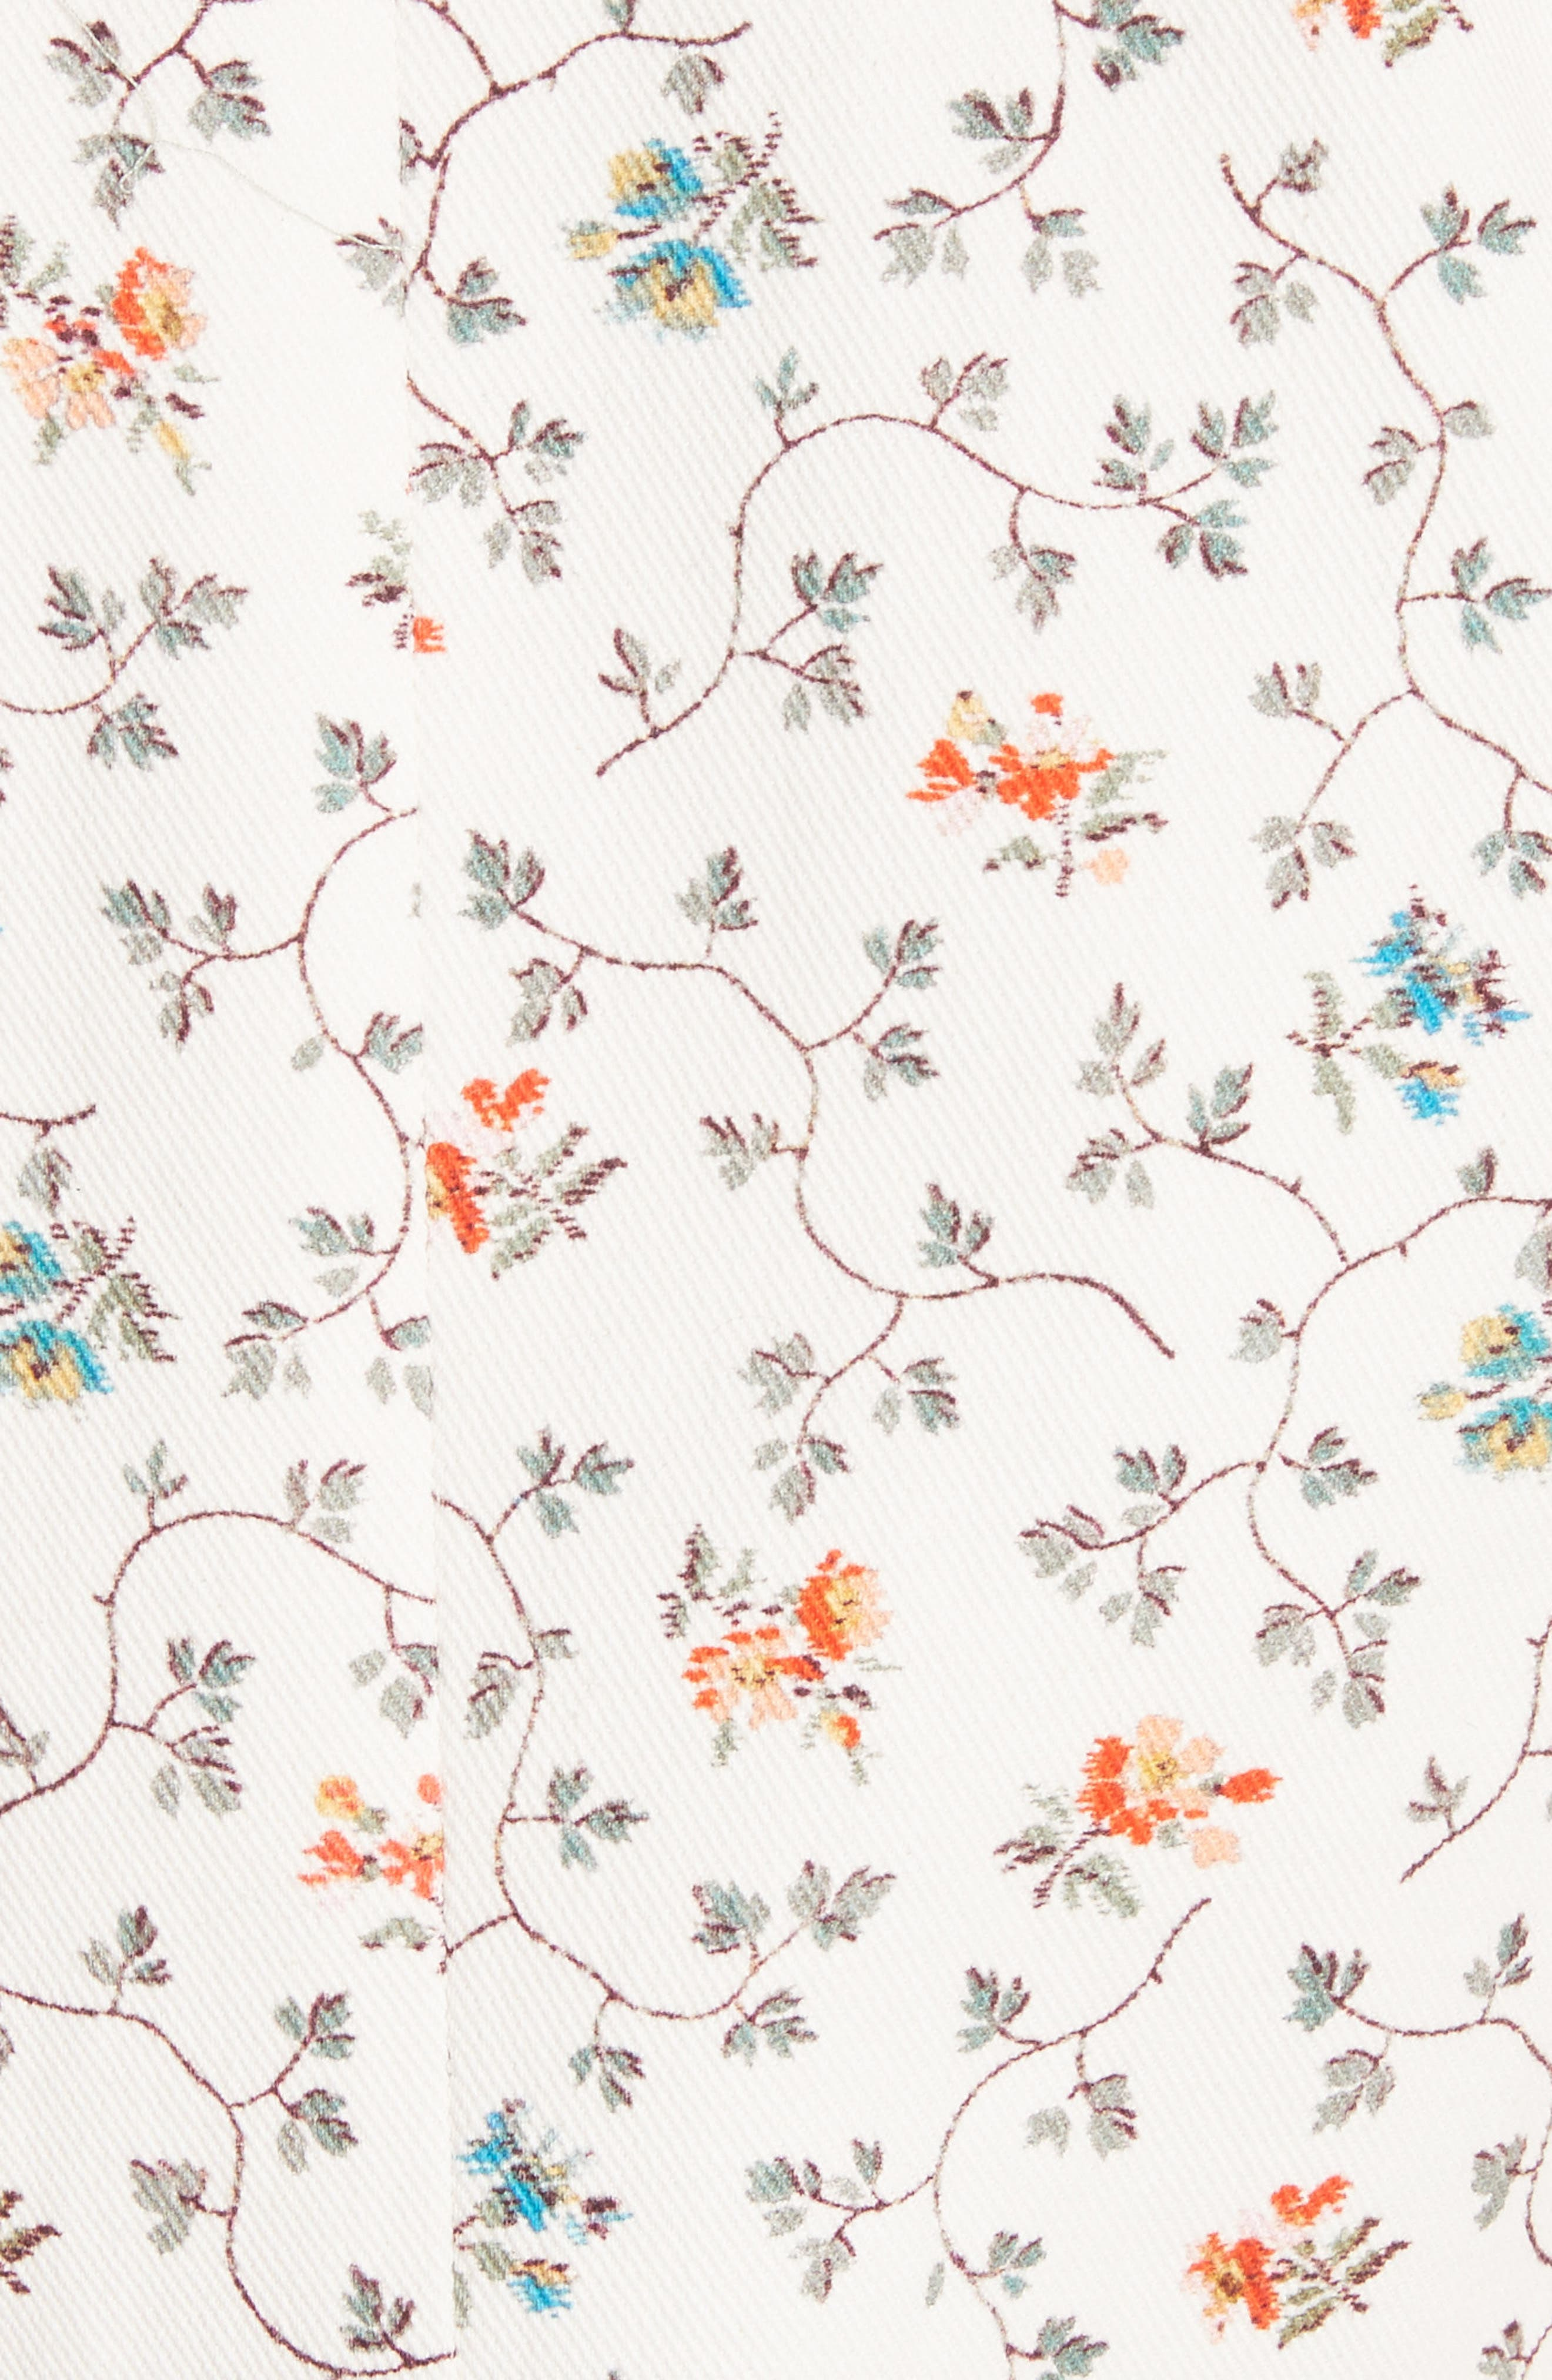 Floral Vine Twill Jacket,                             Alternate thumbnail 6, color,                             909